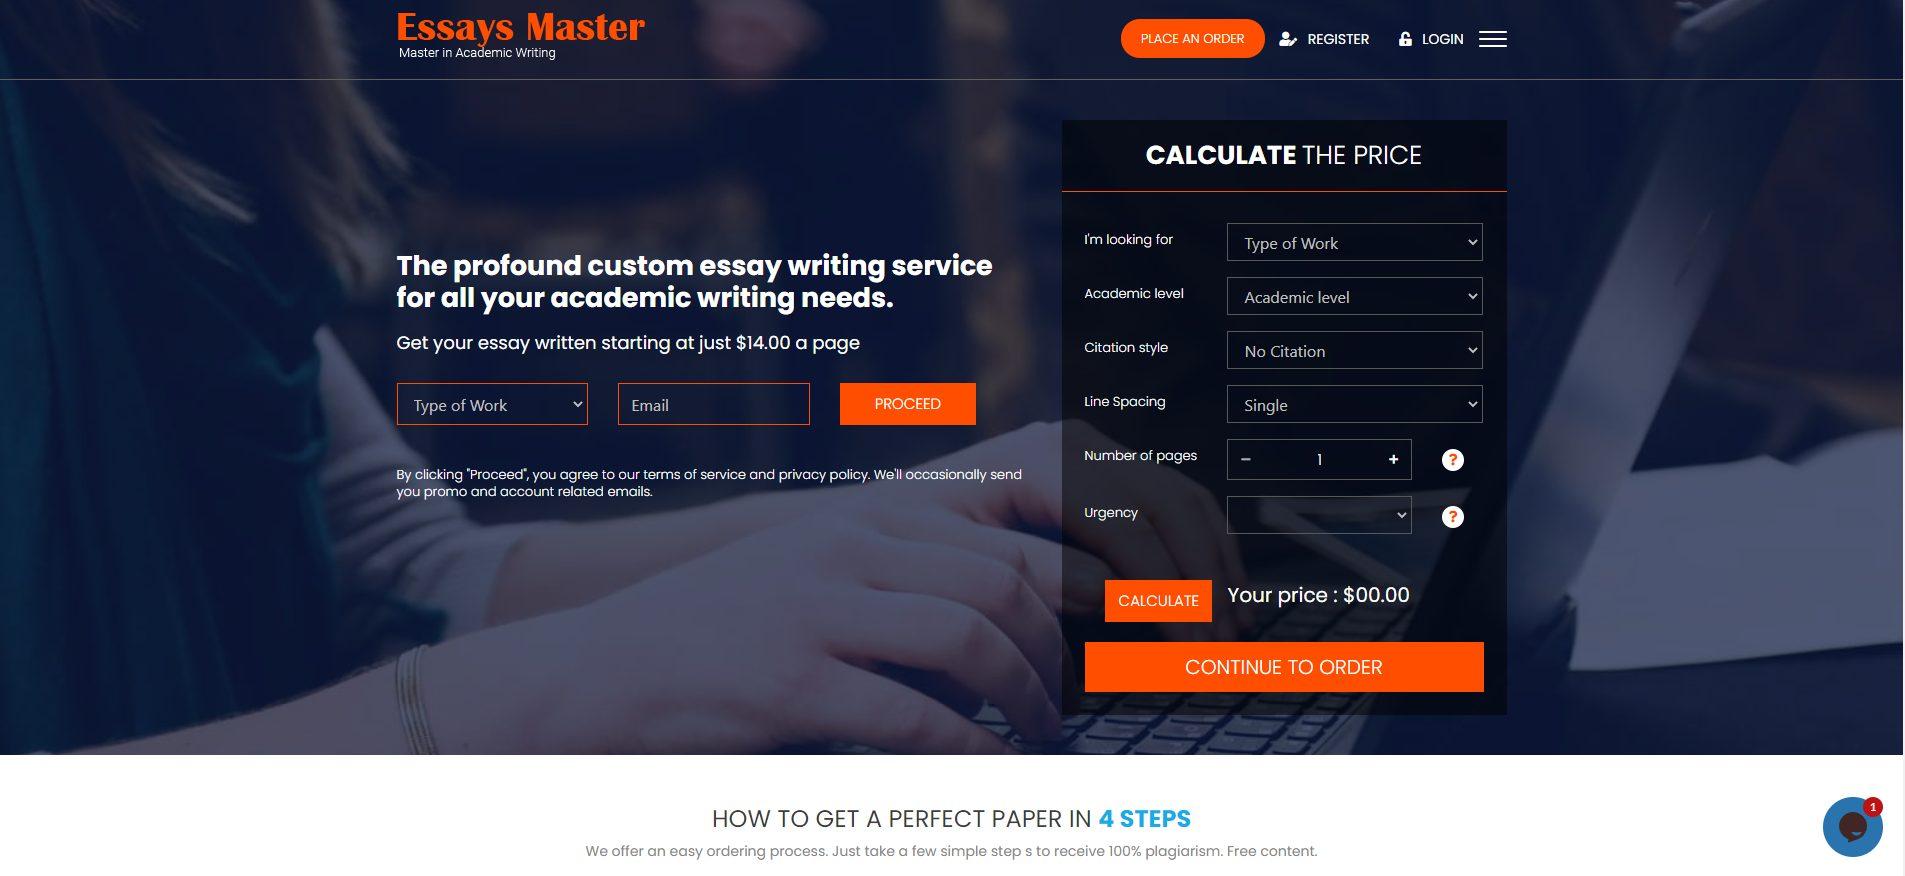 EssaysMaster